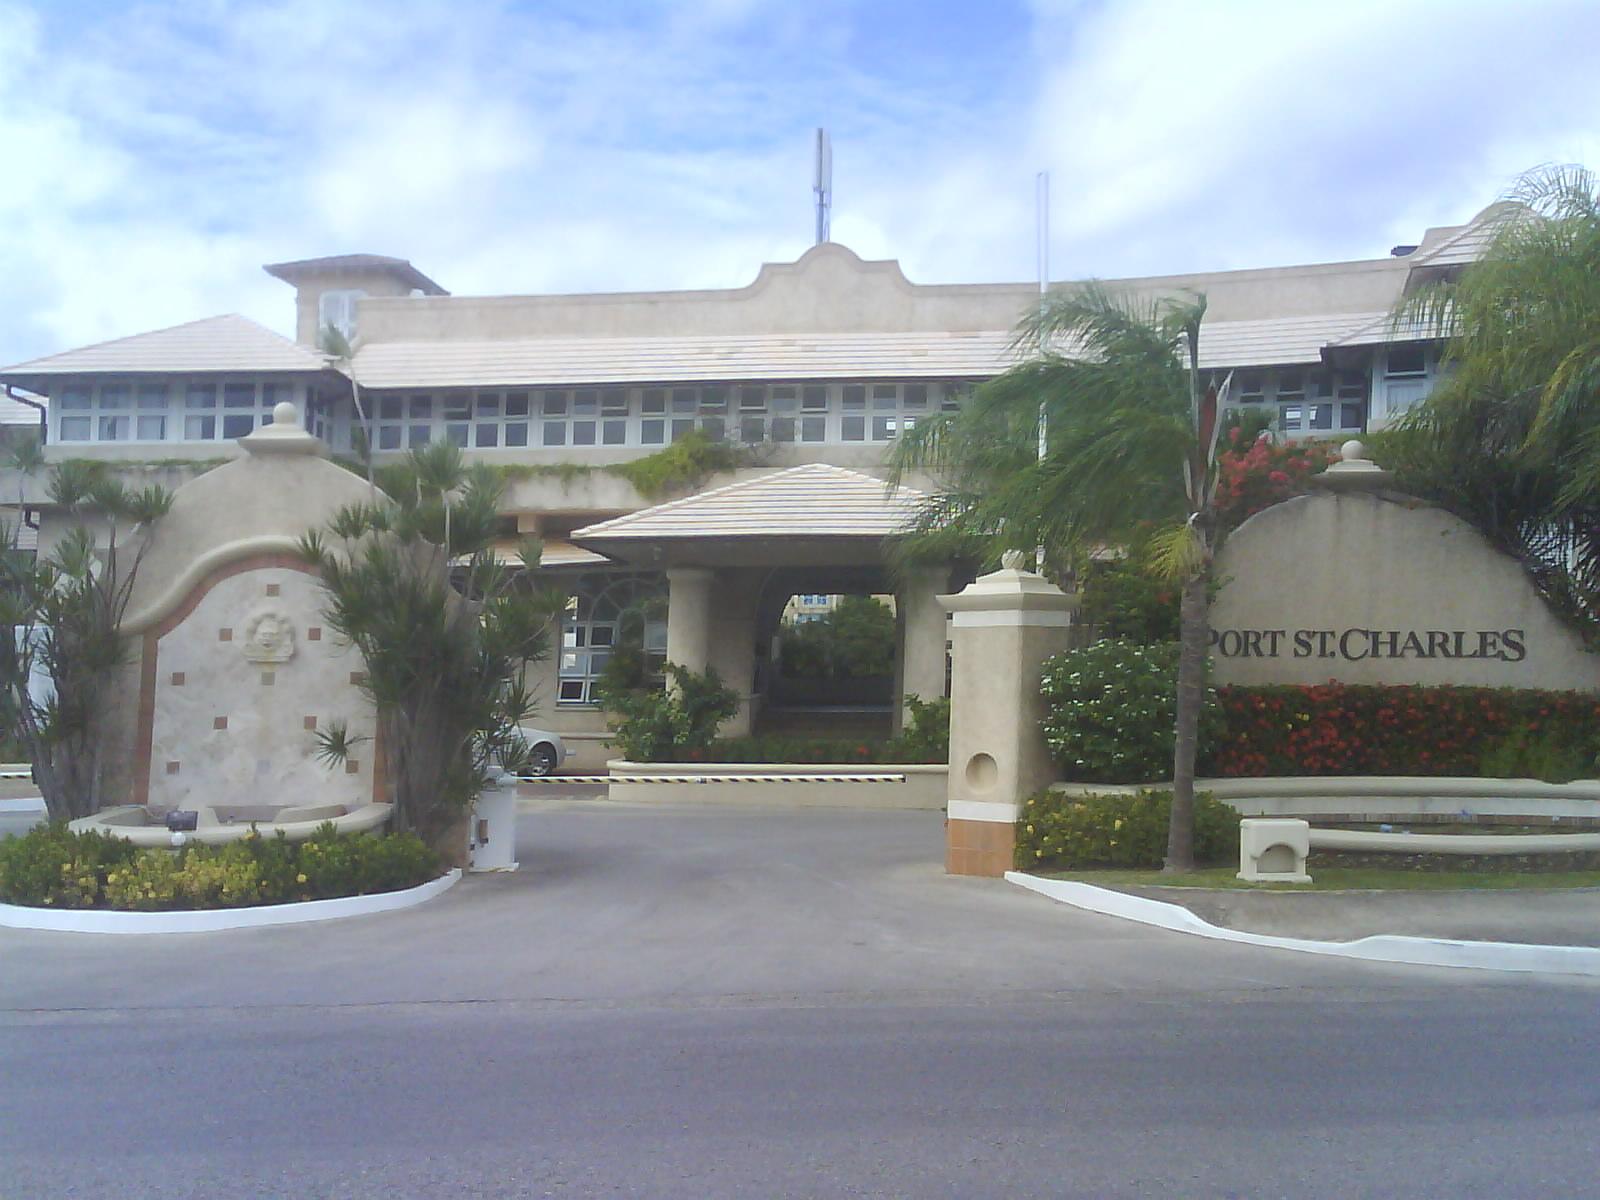 Port St Charles Hotel